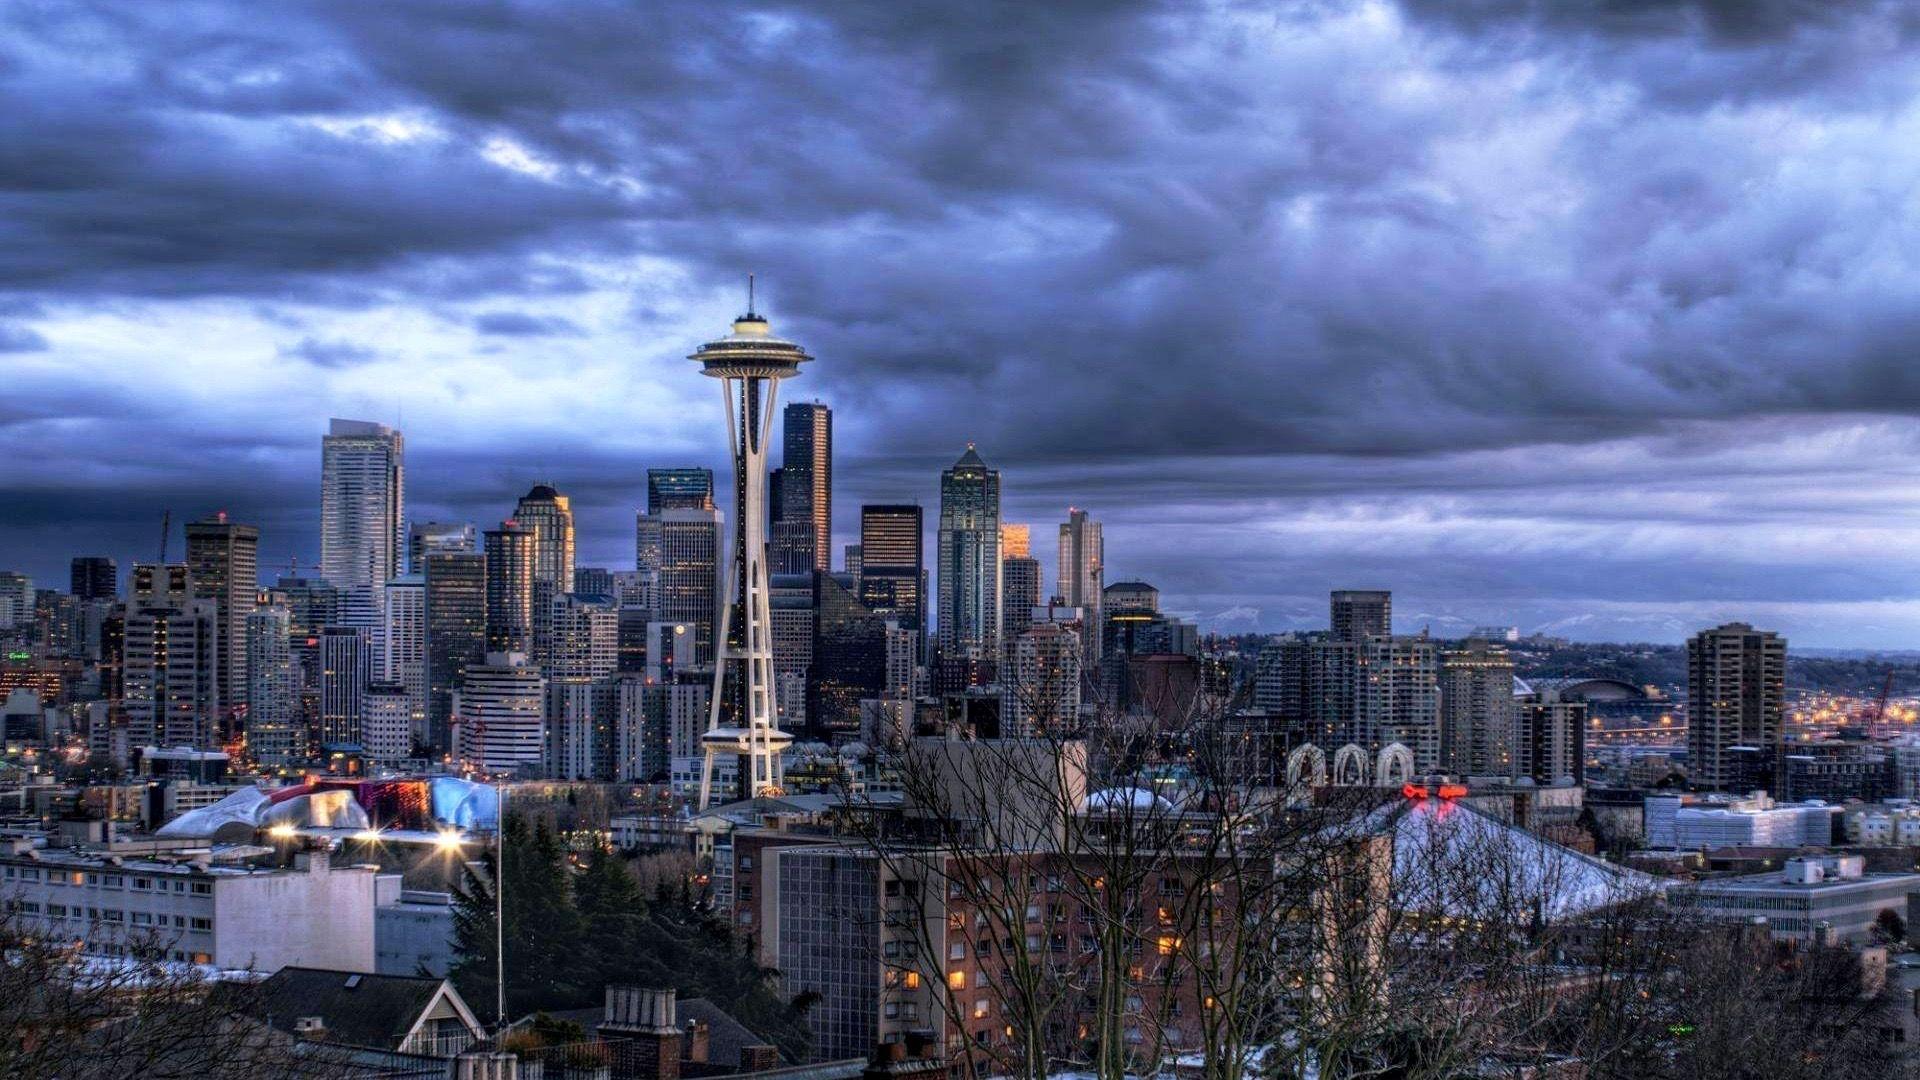 Seattle free image